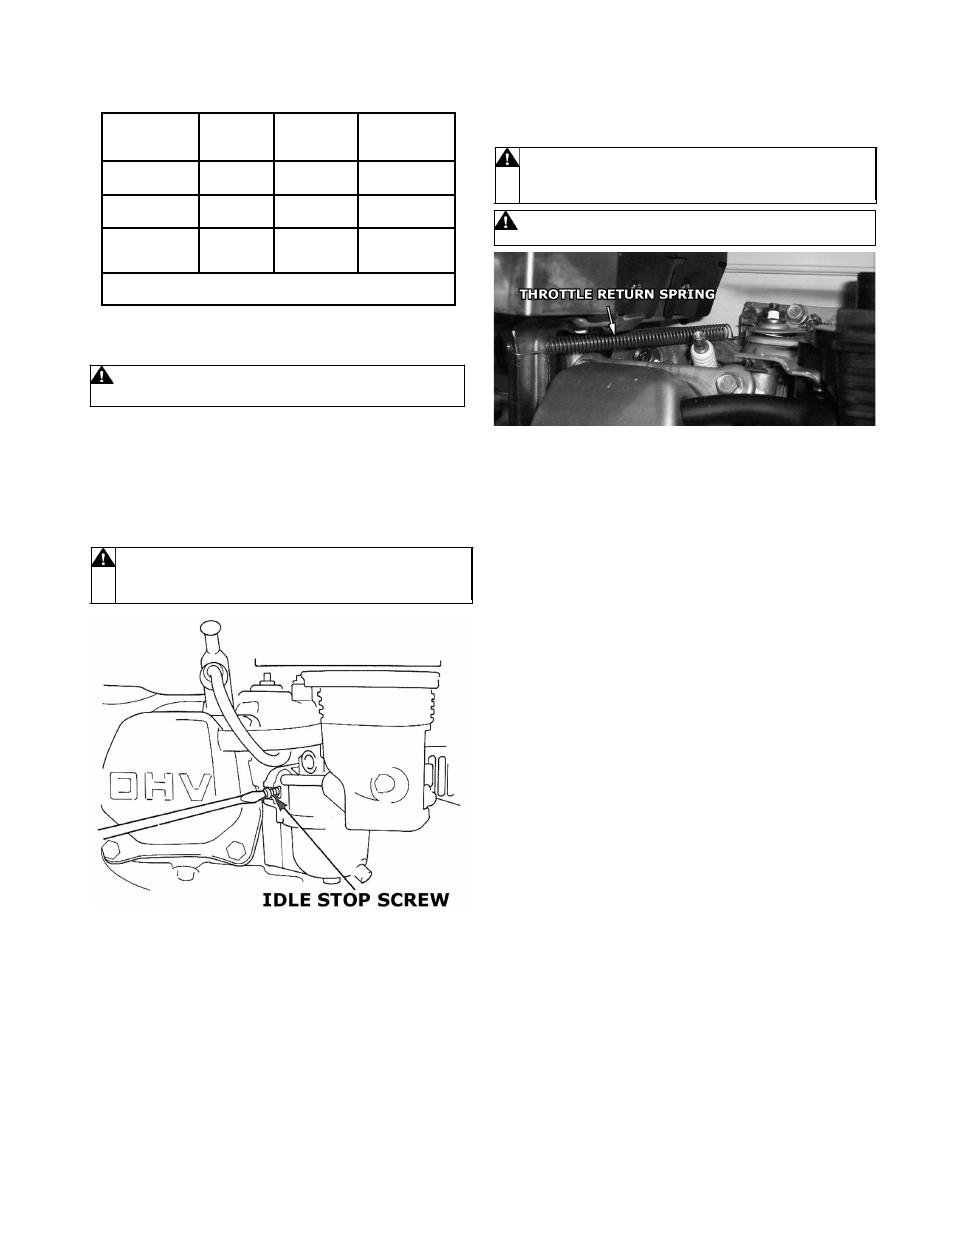 Service manual | PermaGreen Triumph Spreader Sprayer User